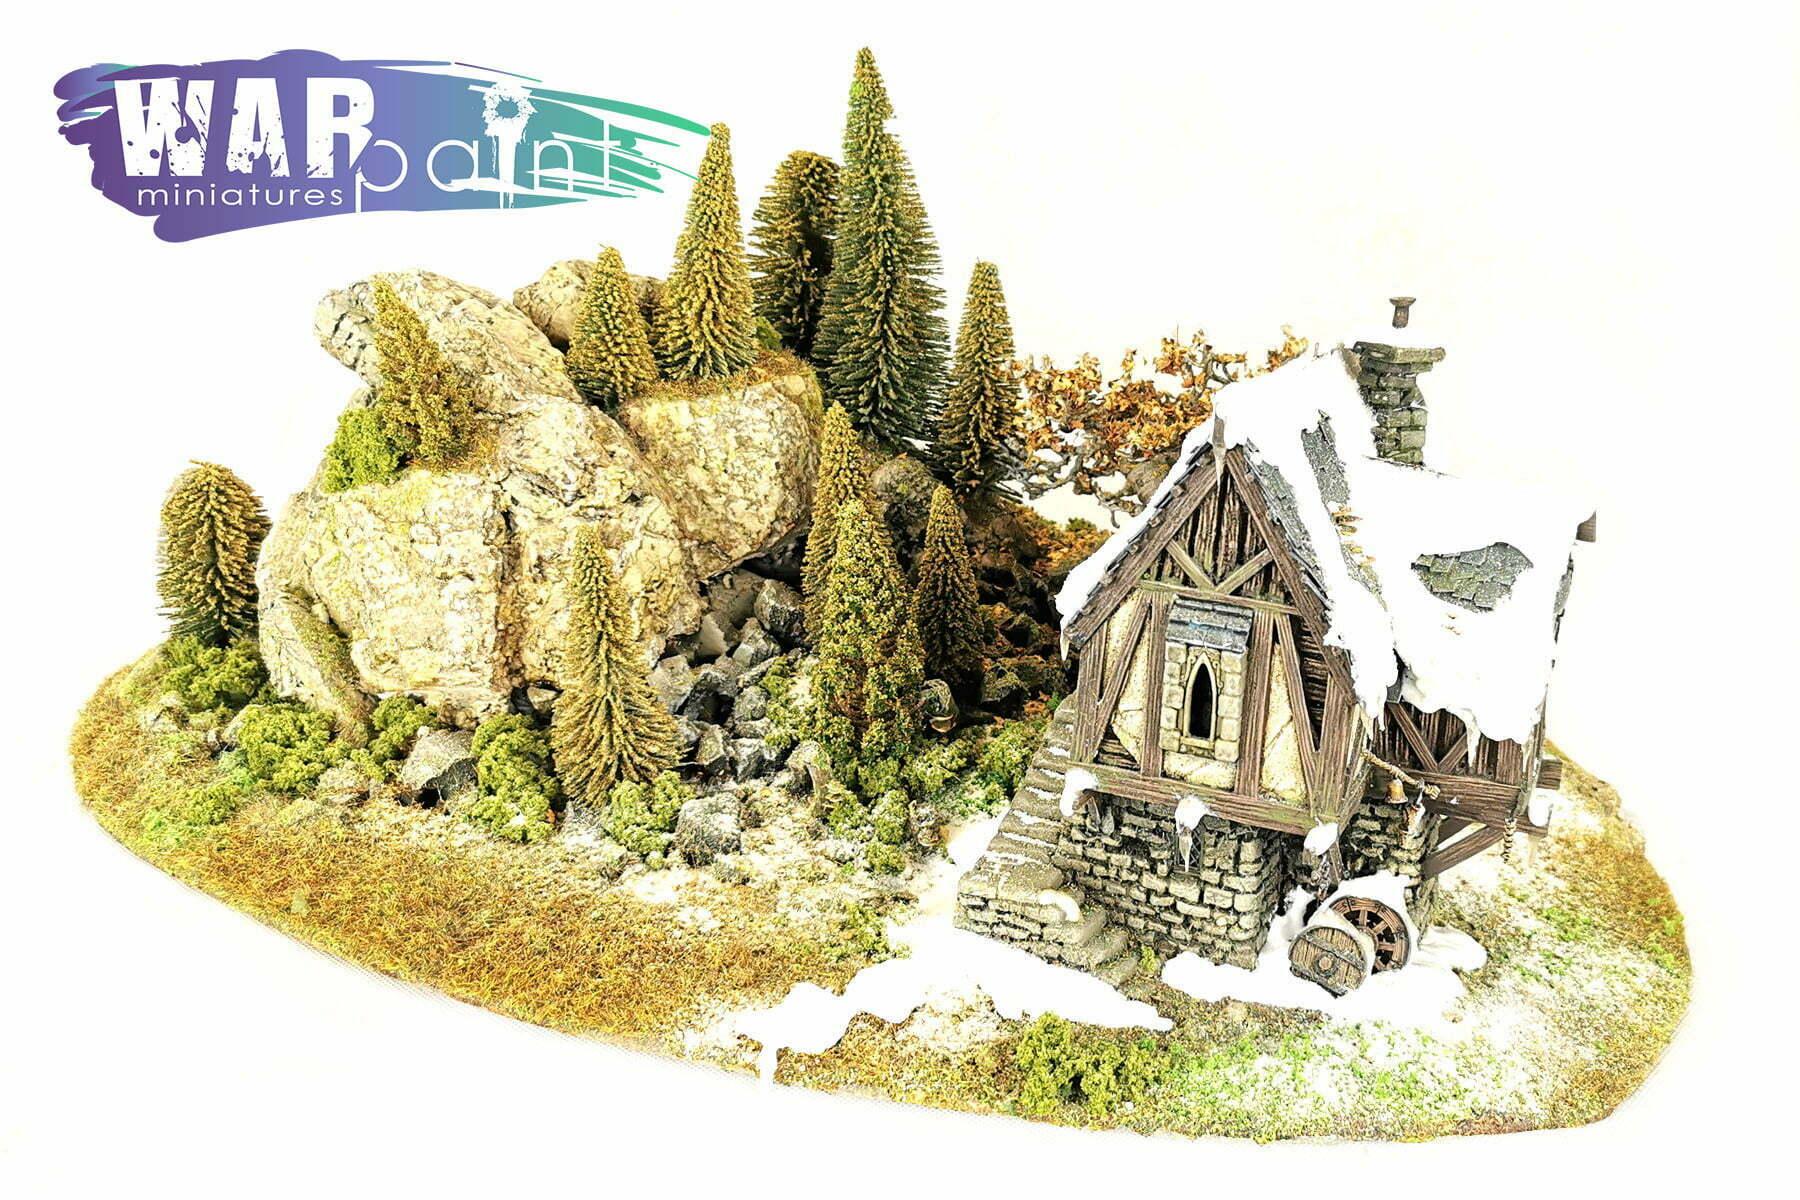 Hunting-Lodge-Scenery-web-optimised-7